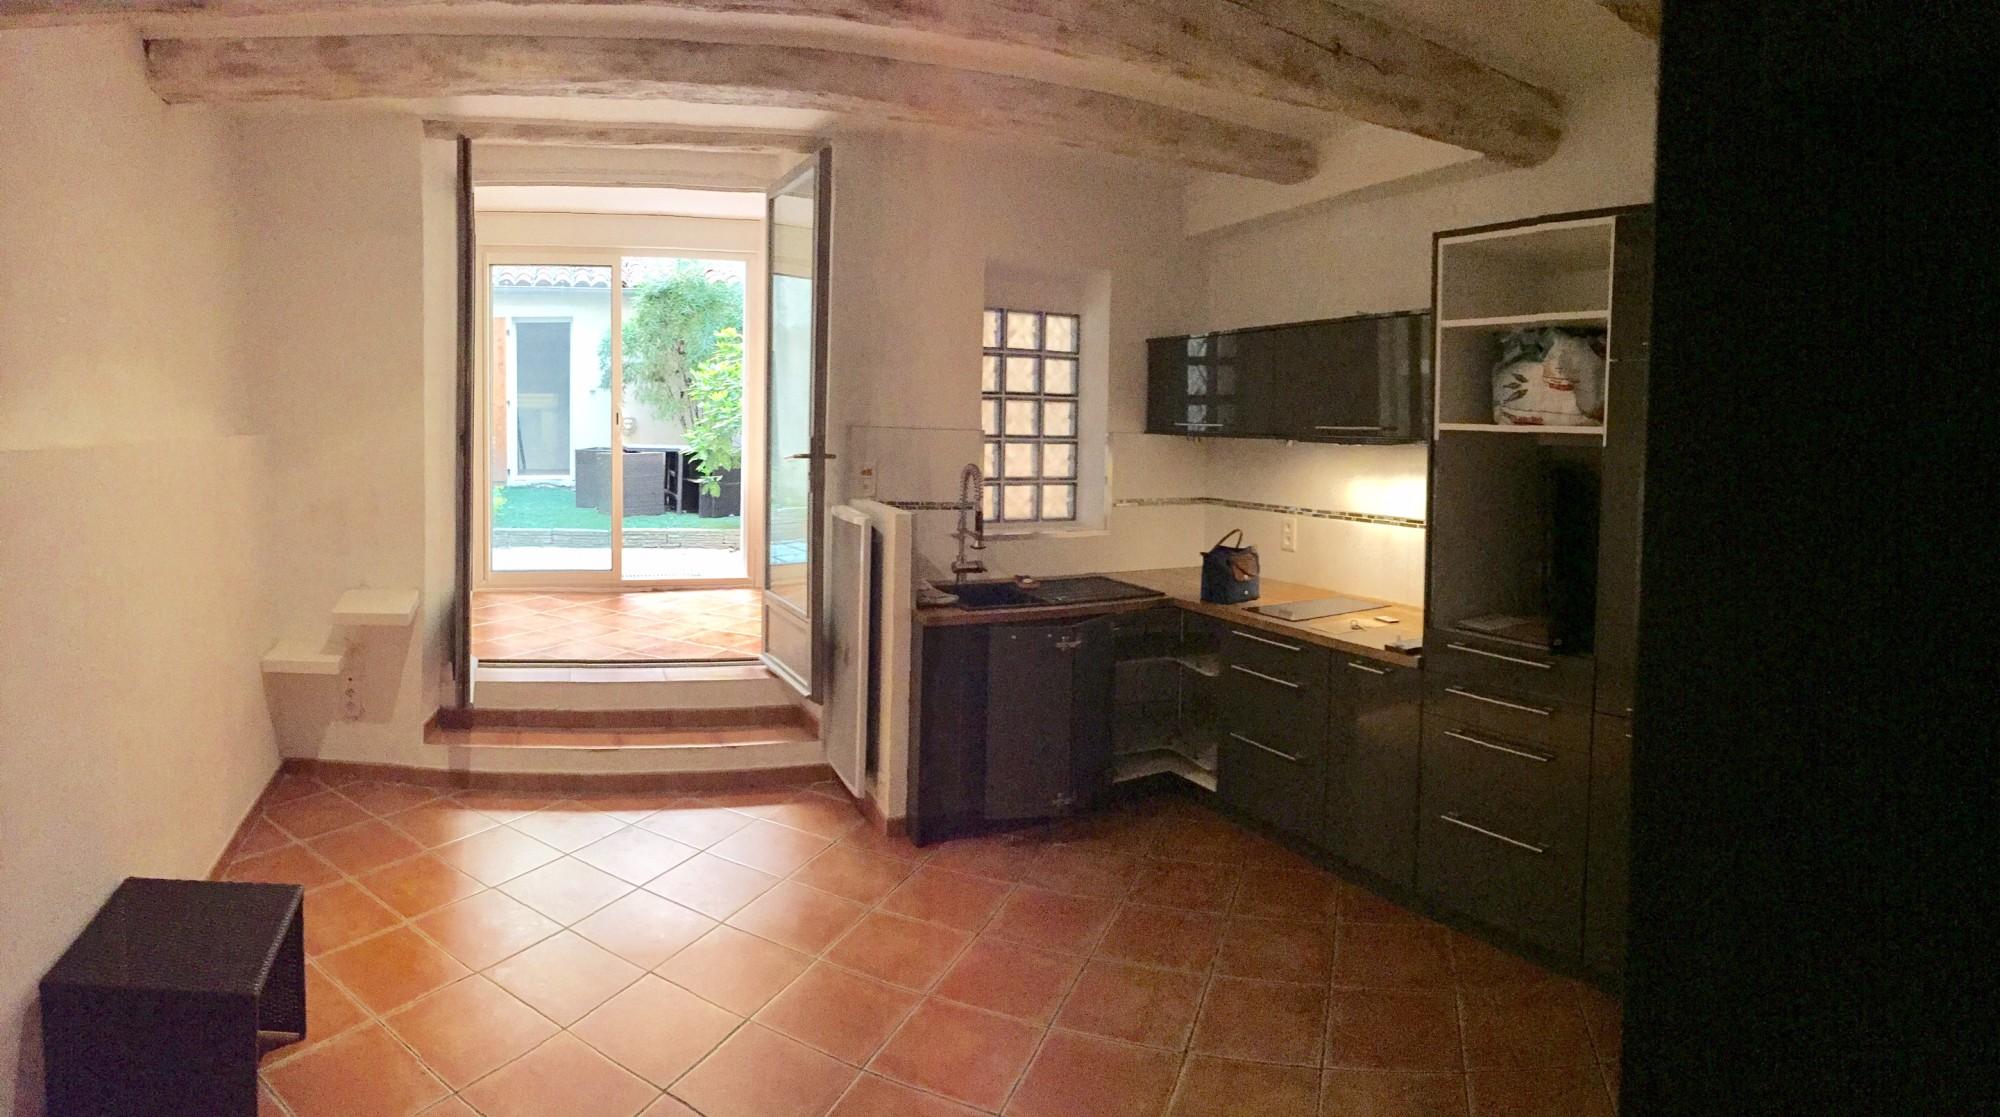 location appartement t2 aix en provence. Black Bedroom Furniture Sets. Home Design Ideas